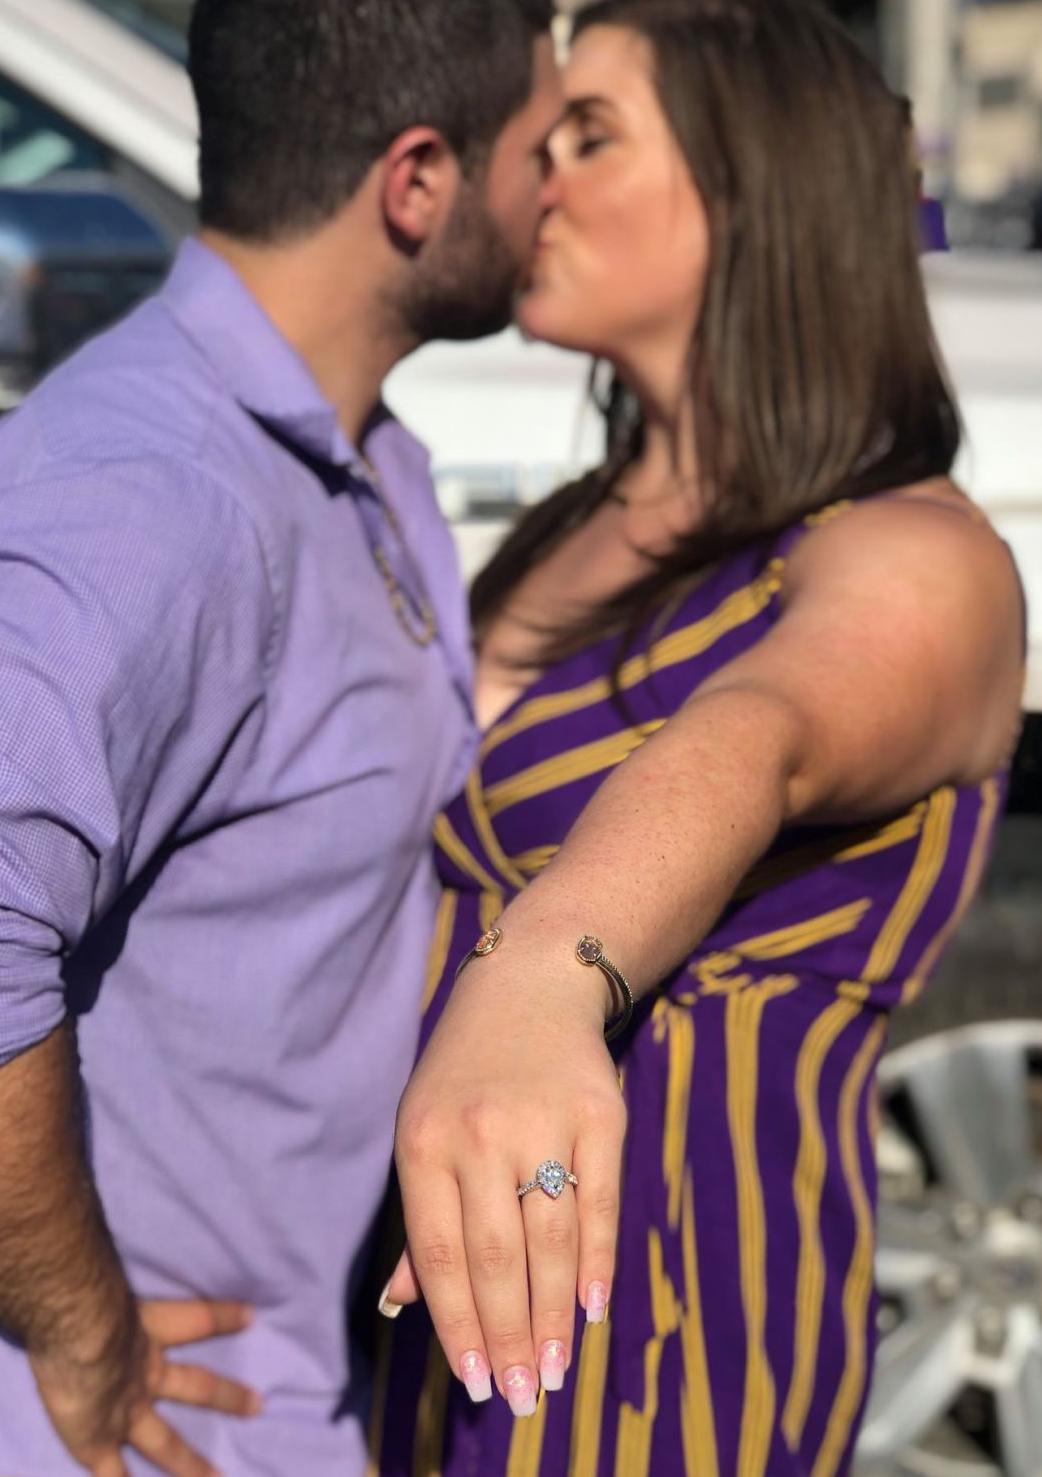 Marriage Proposal at LSU-Texas Game